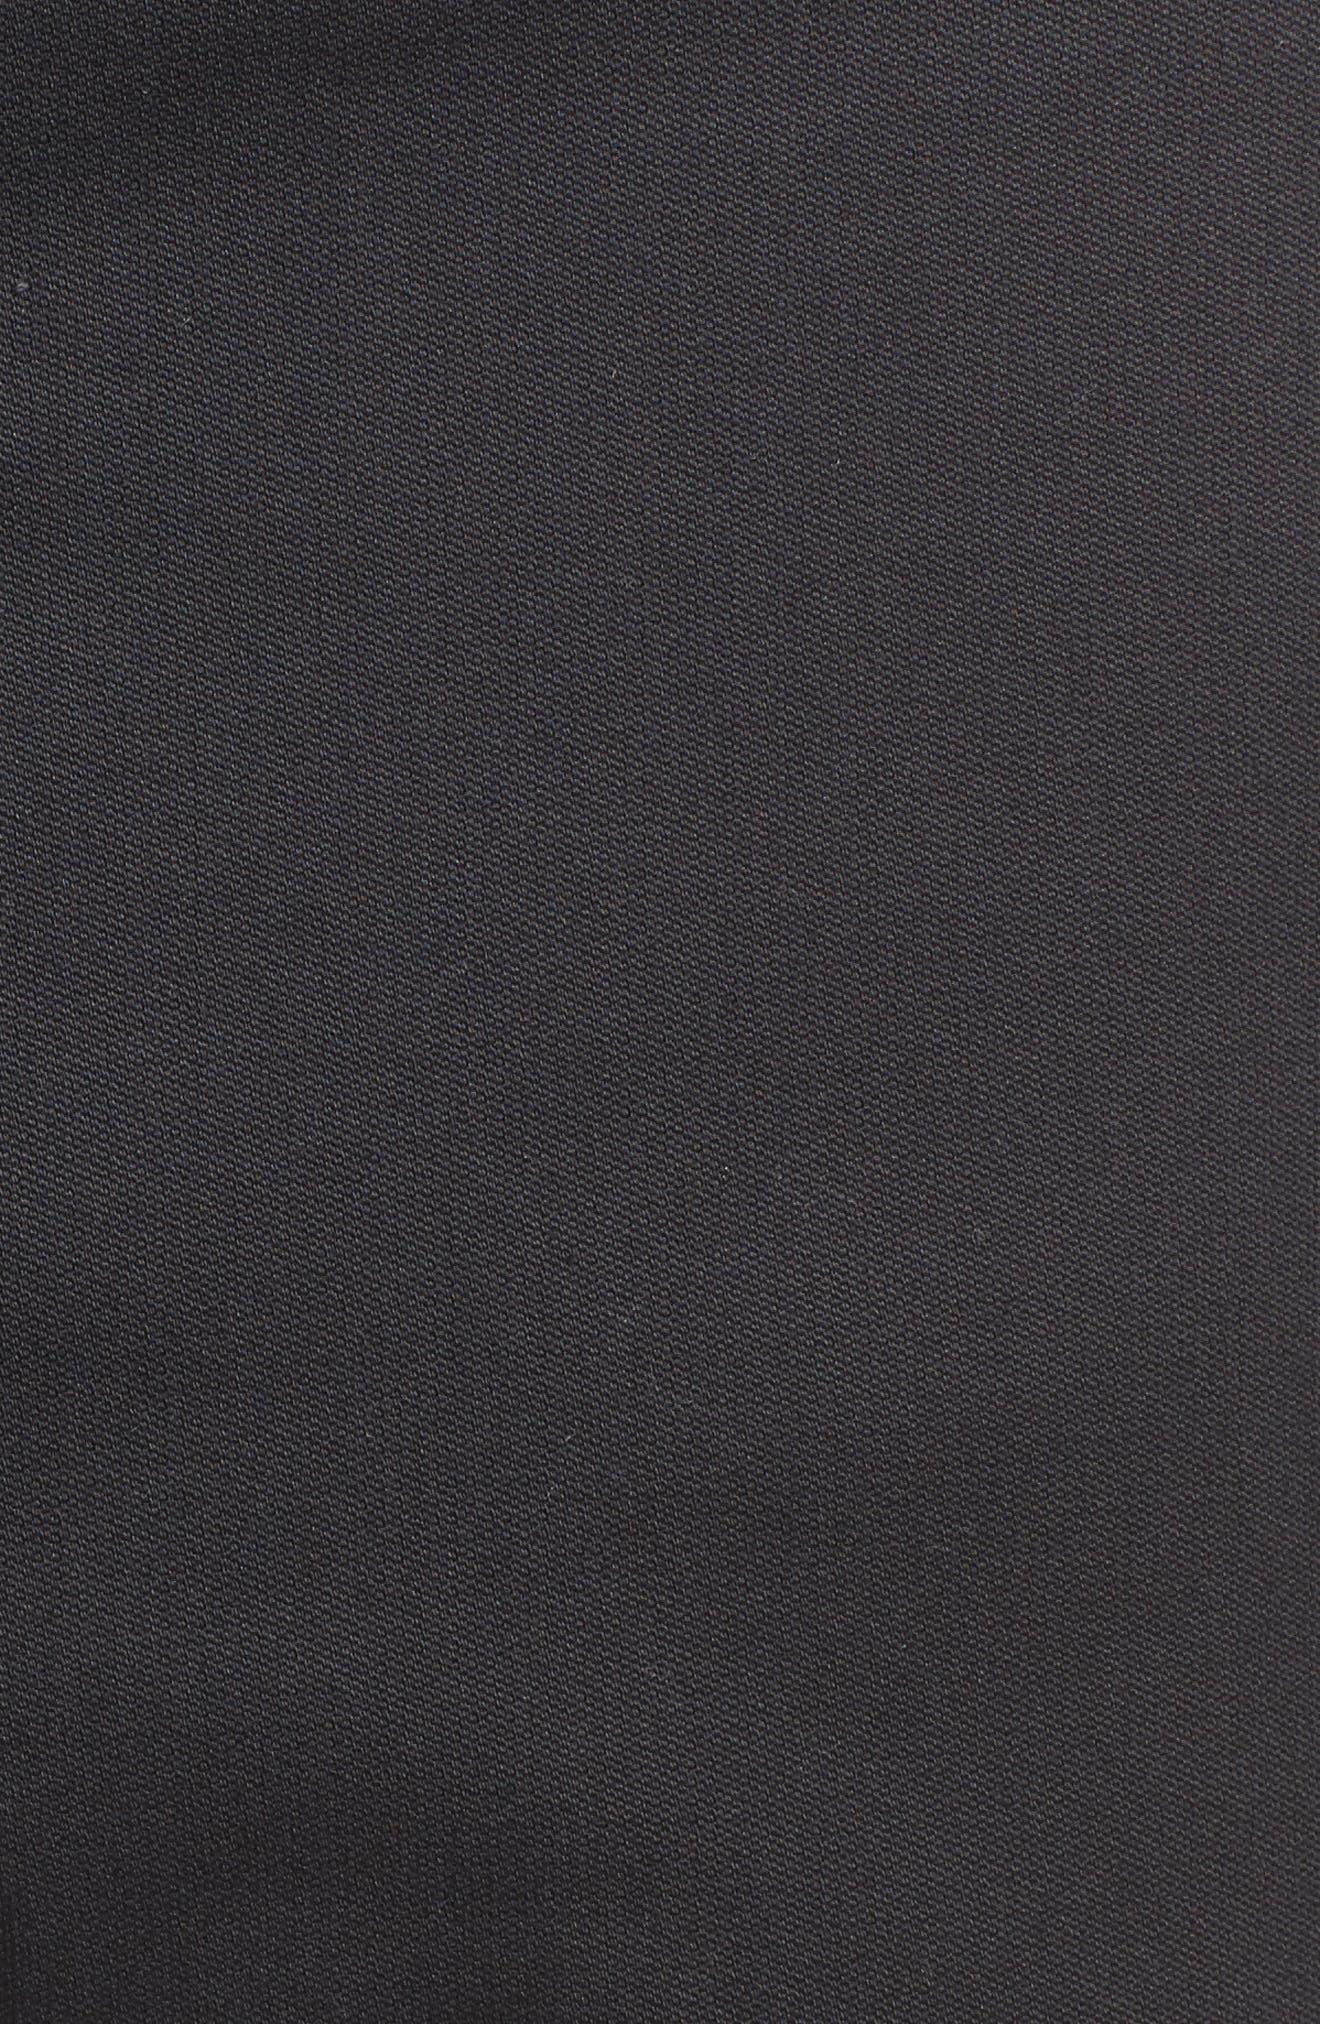 Covert Slim Fit Crop Pants,                             Alternate thumbnail 5, color,                             Black